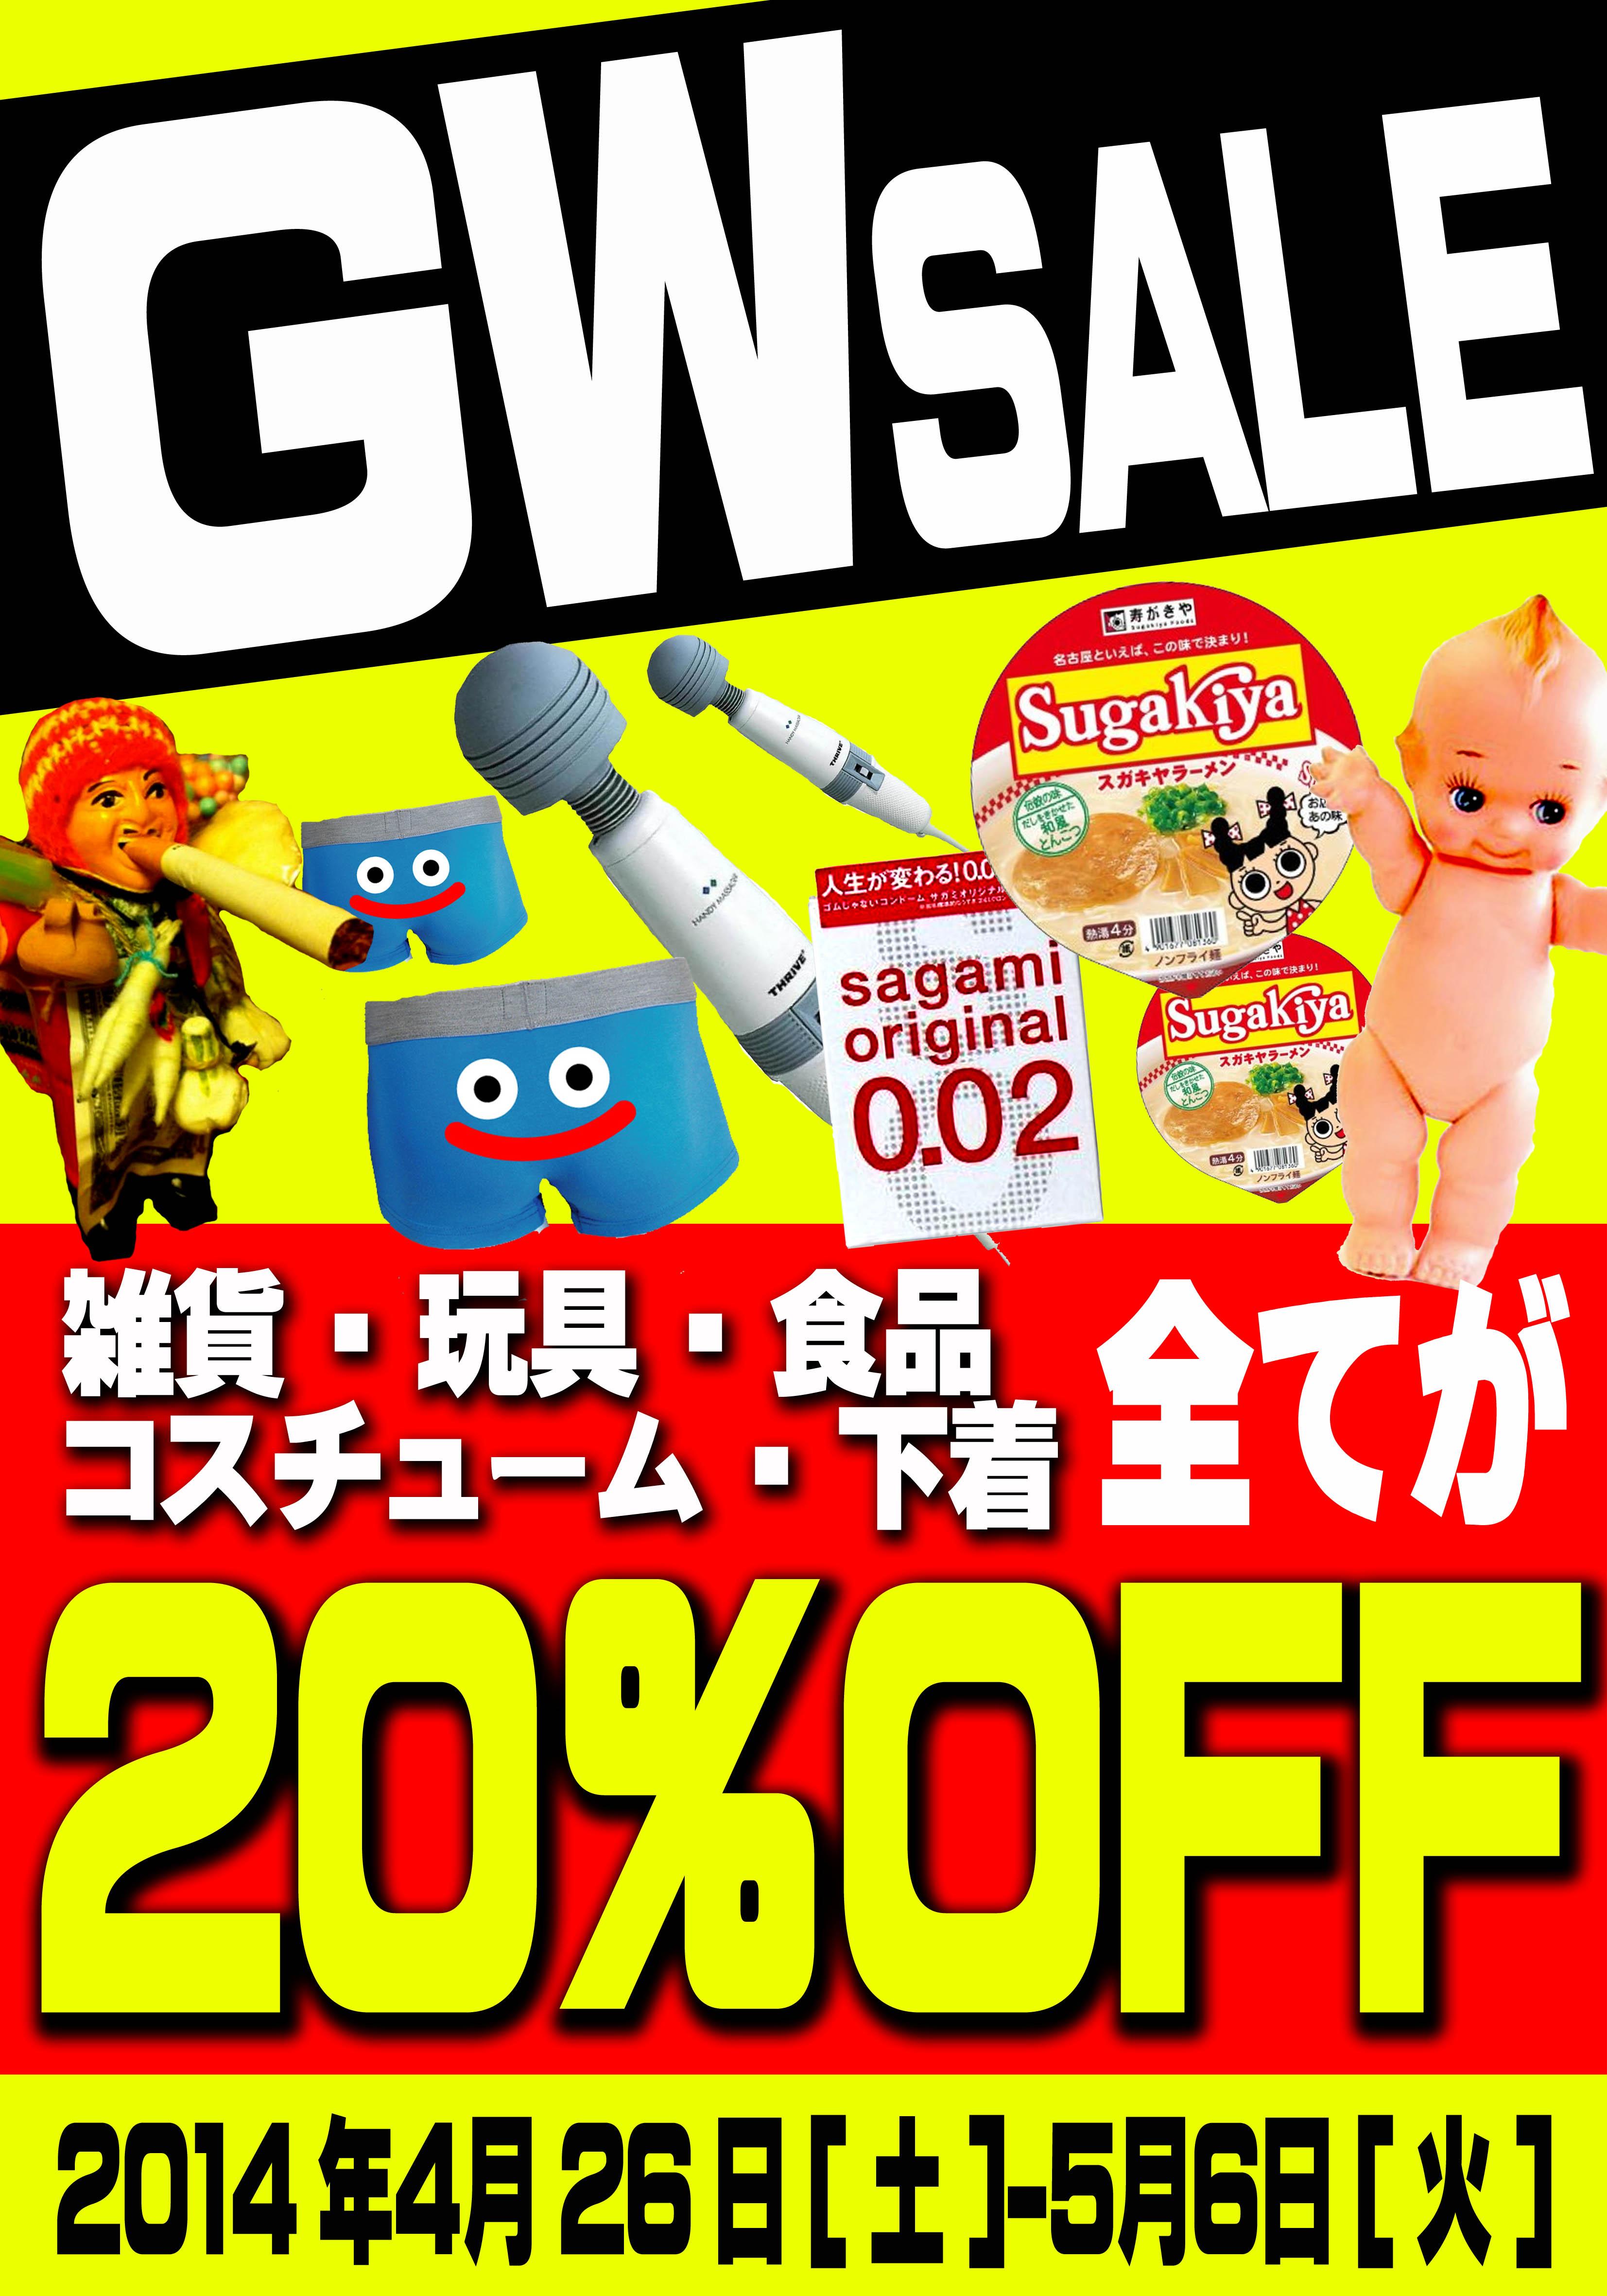 GWsale 玩具SALE 2014版のコピー